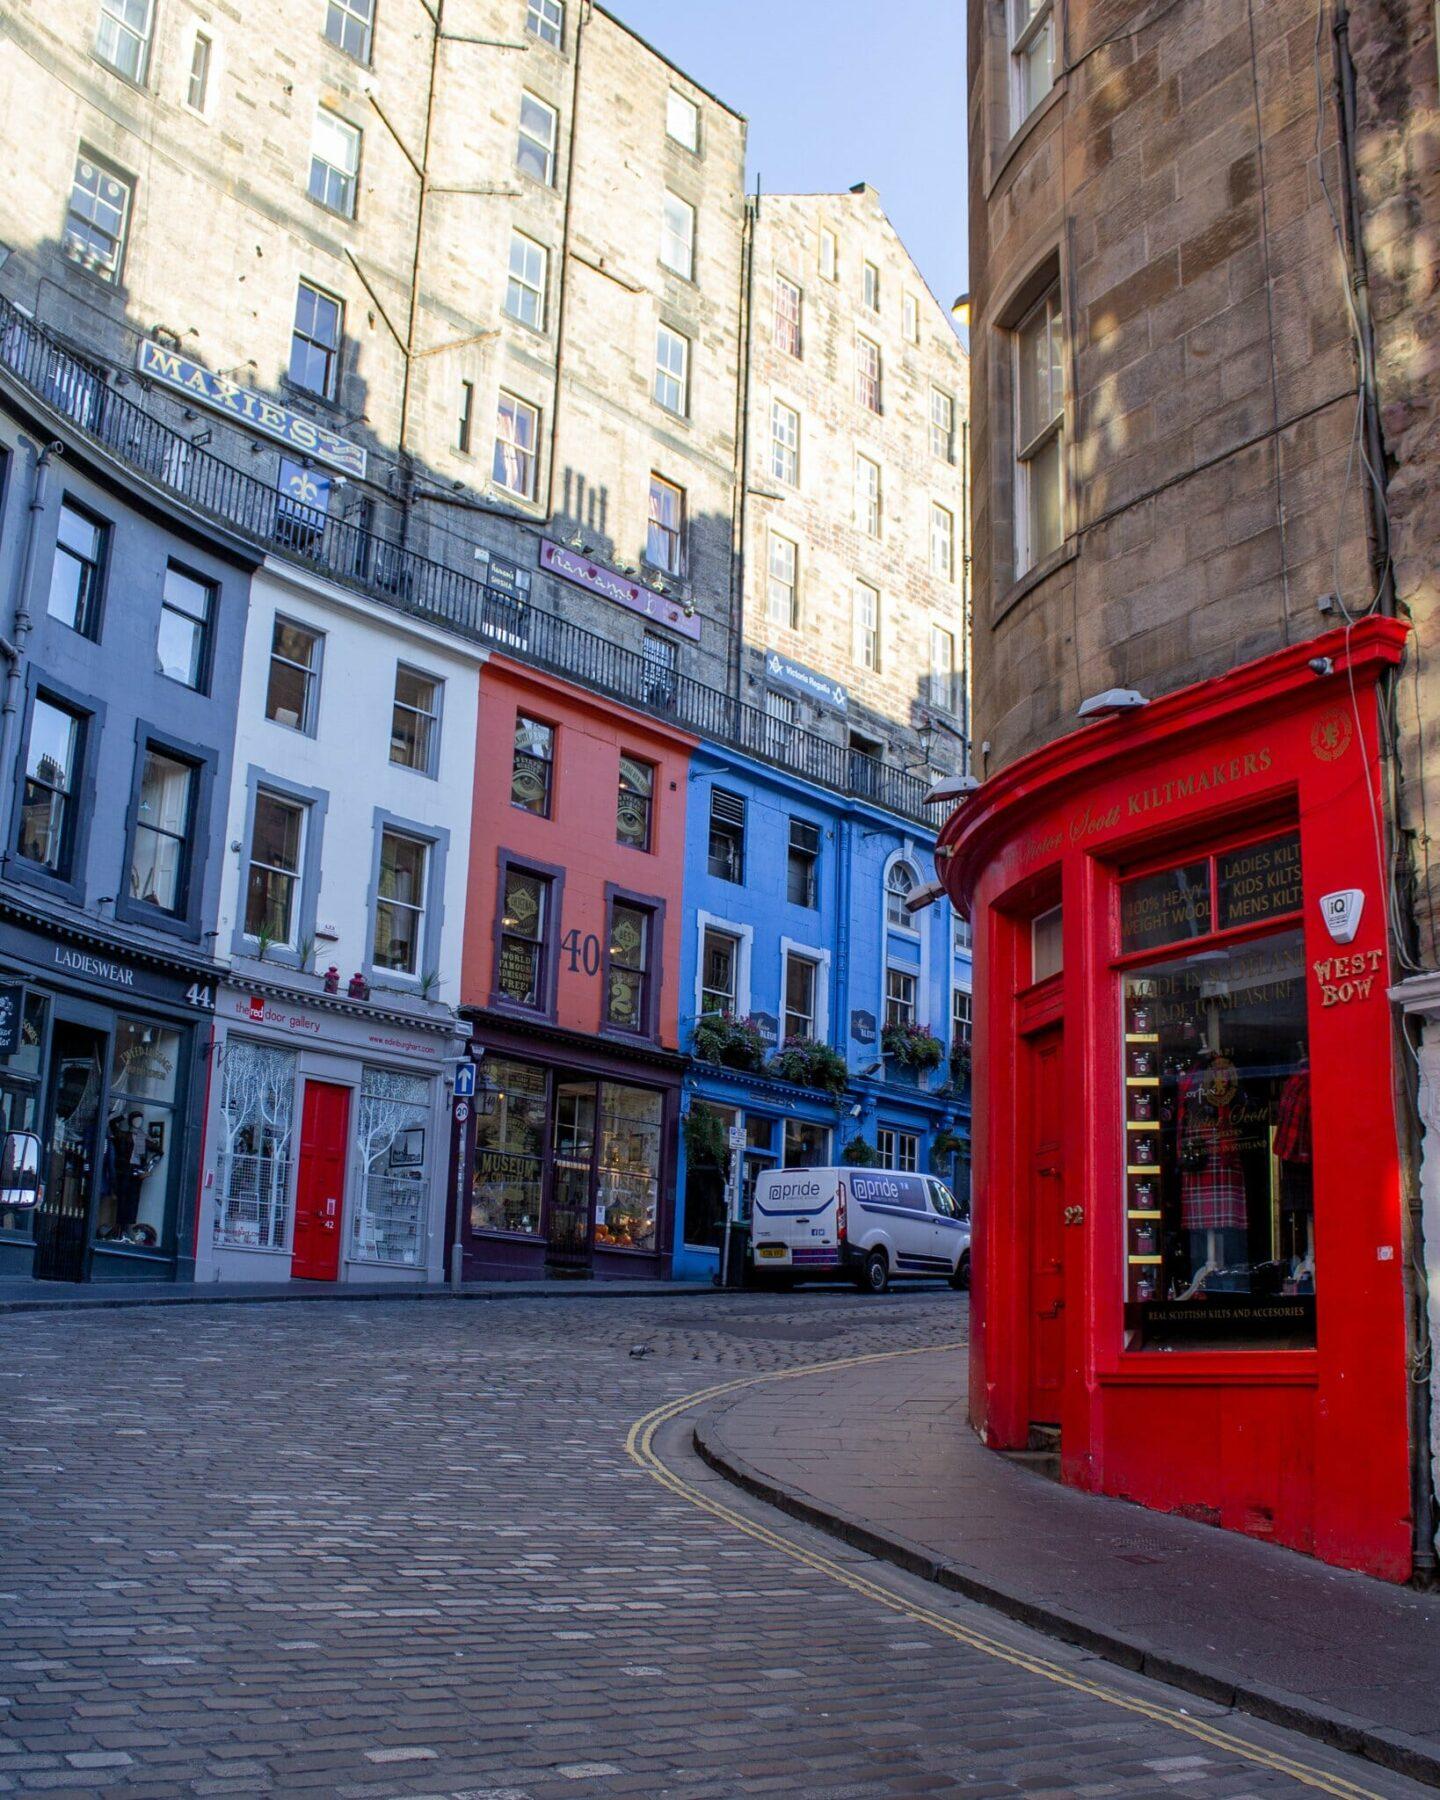 48 hours in Edinburgh - Victoria Street